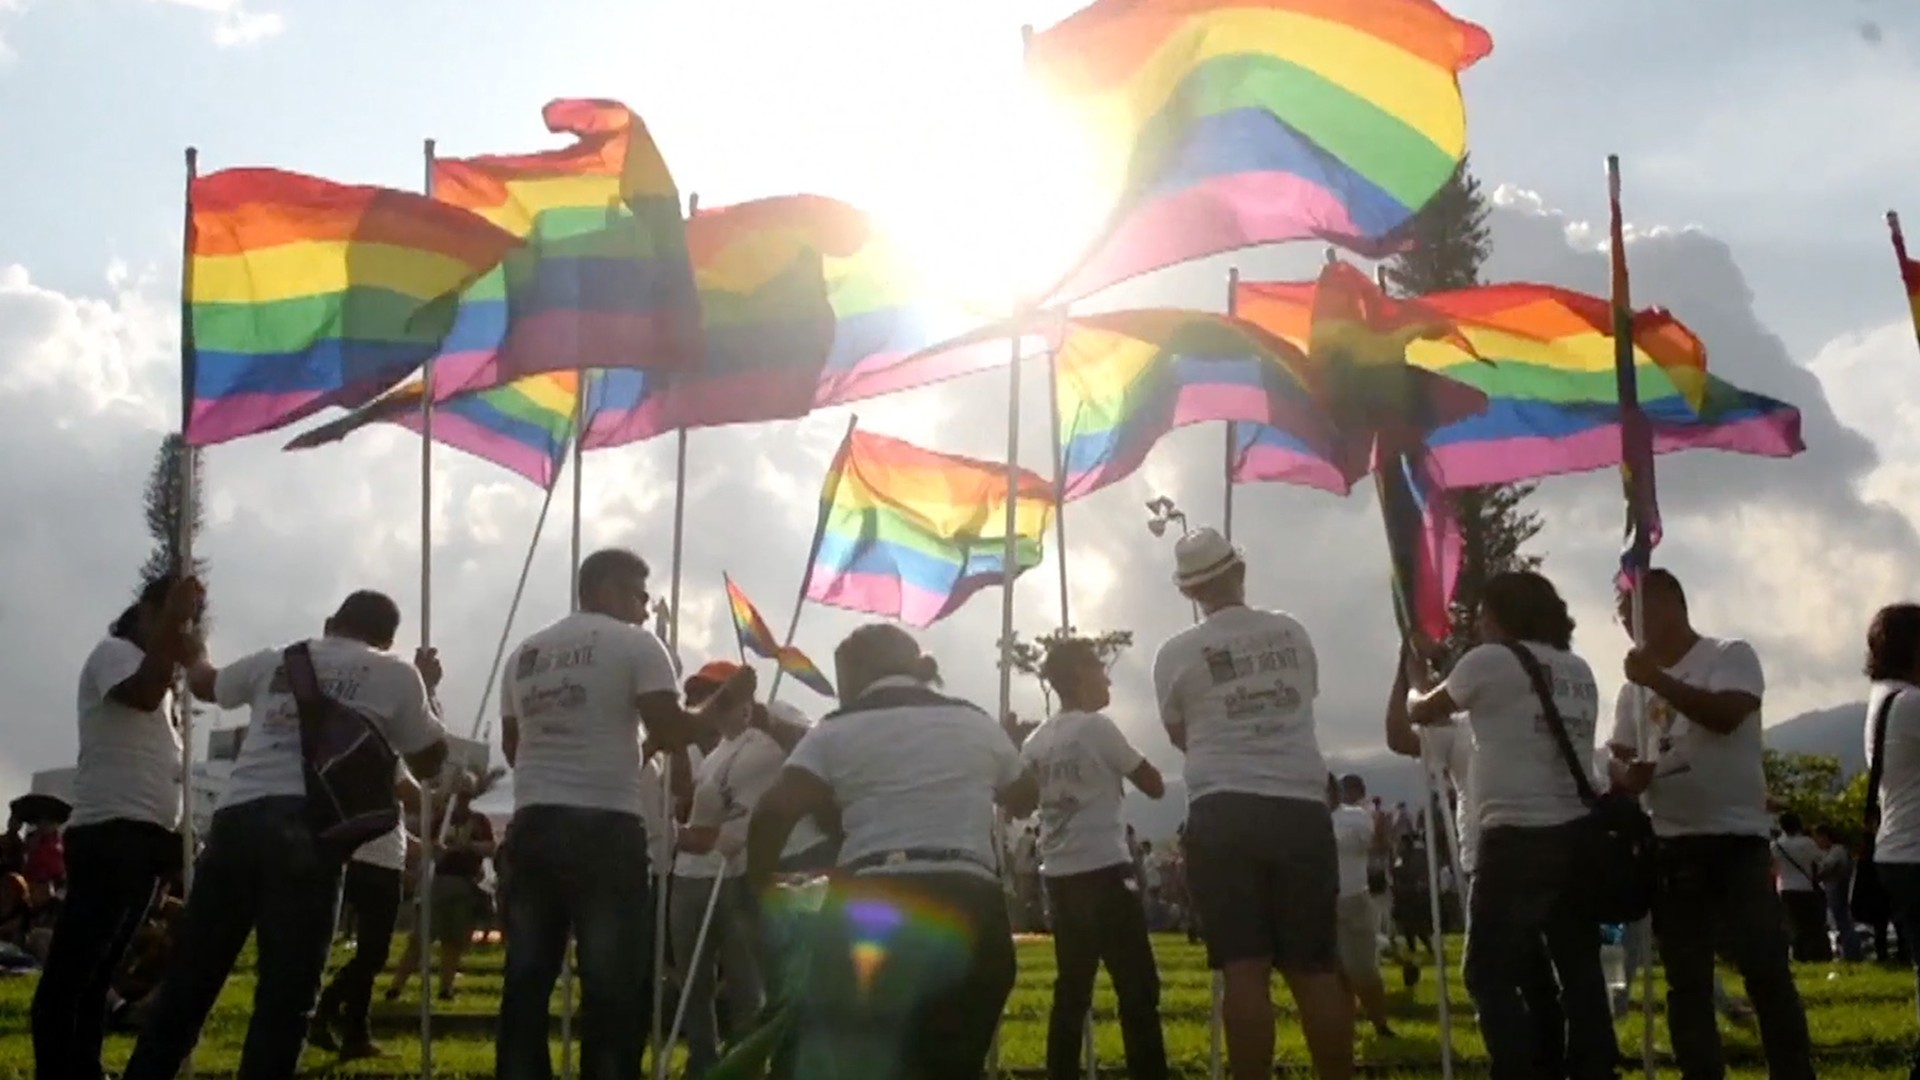 LGBTQ Rights in Bathrooms